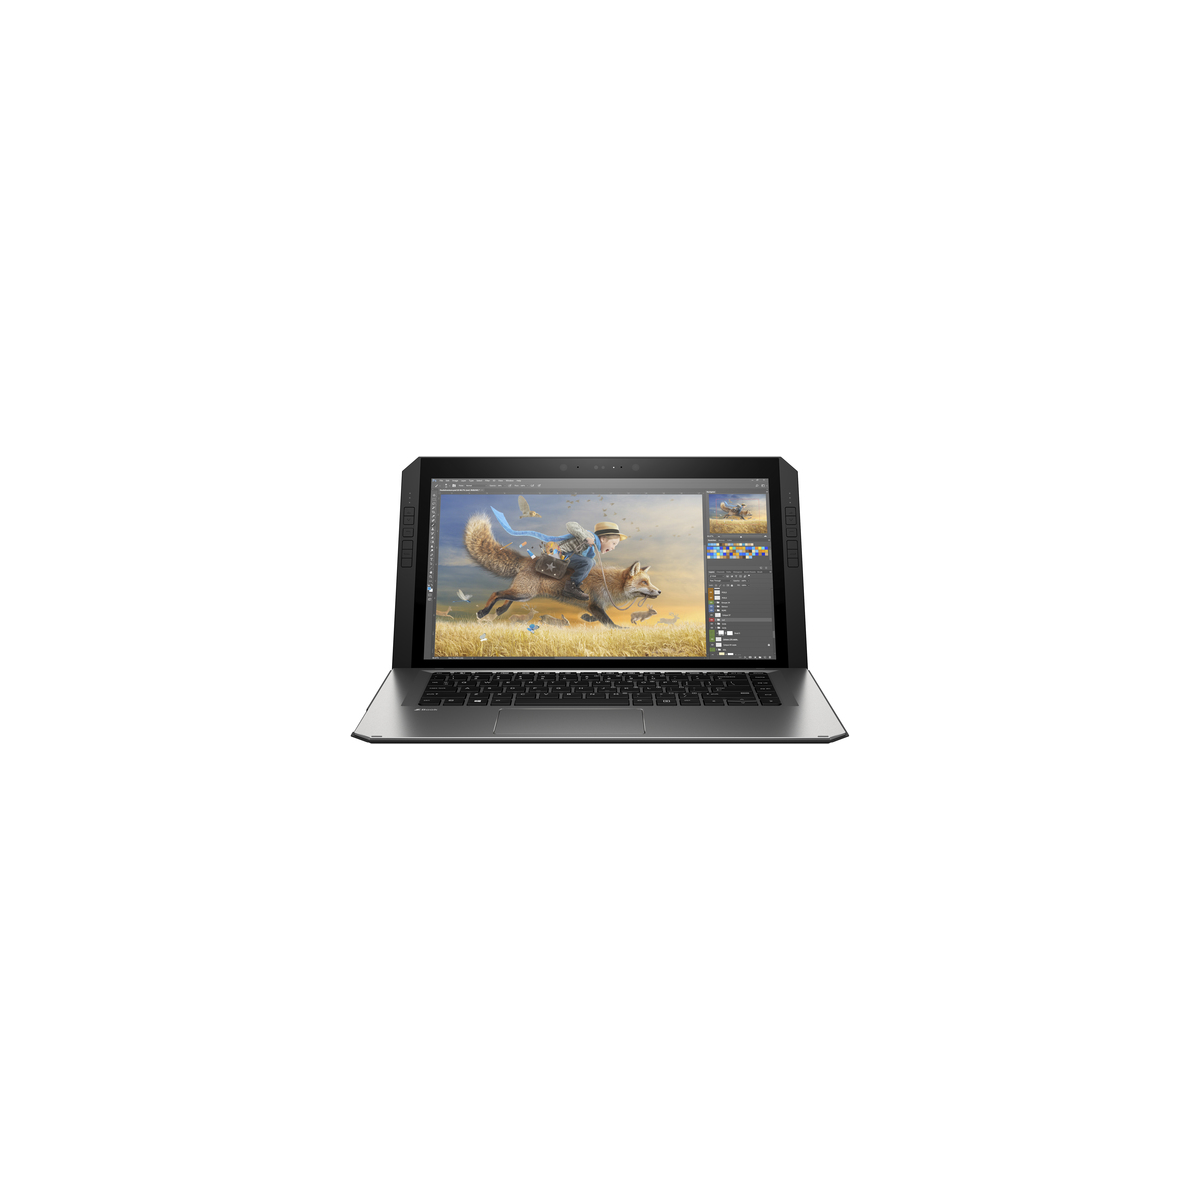 HP Zbook x2 G4 Intel Core i7 8550U Quad Core RAM 16G SSD 512G 14 Windows 10 Pro Nvidia Quadro M 620 2 Go HP - 1